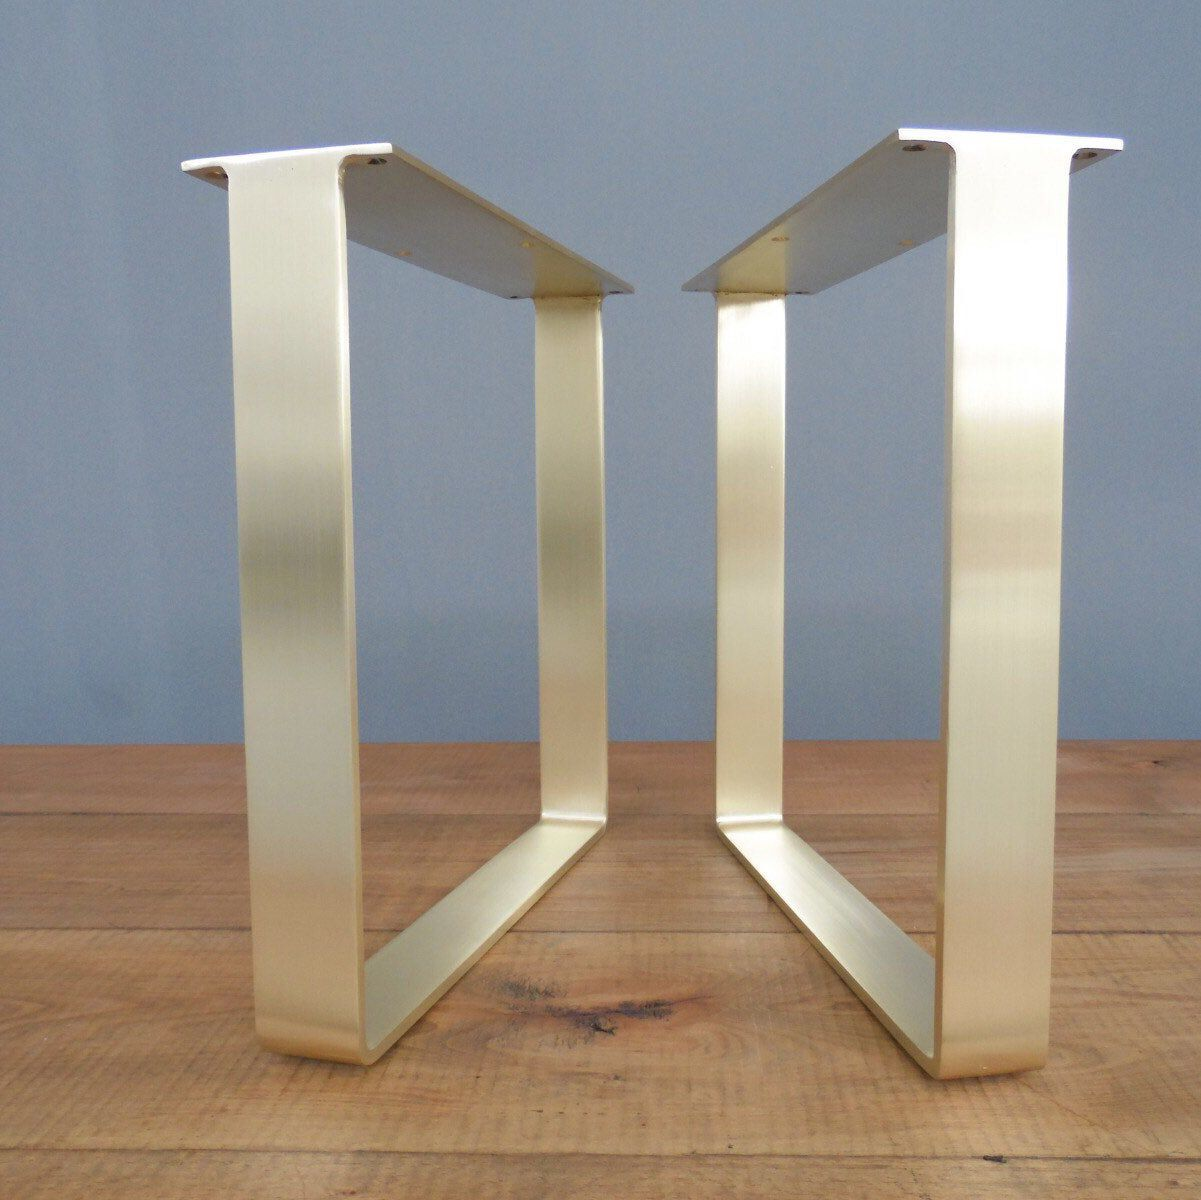 Brass Table Legs 16 Flat Brass Coffee Table Legs Sofa Legs